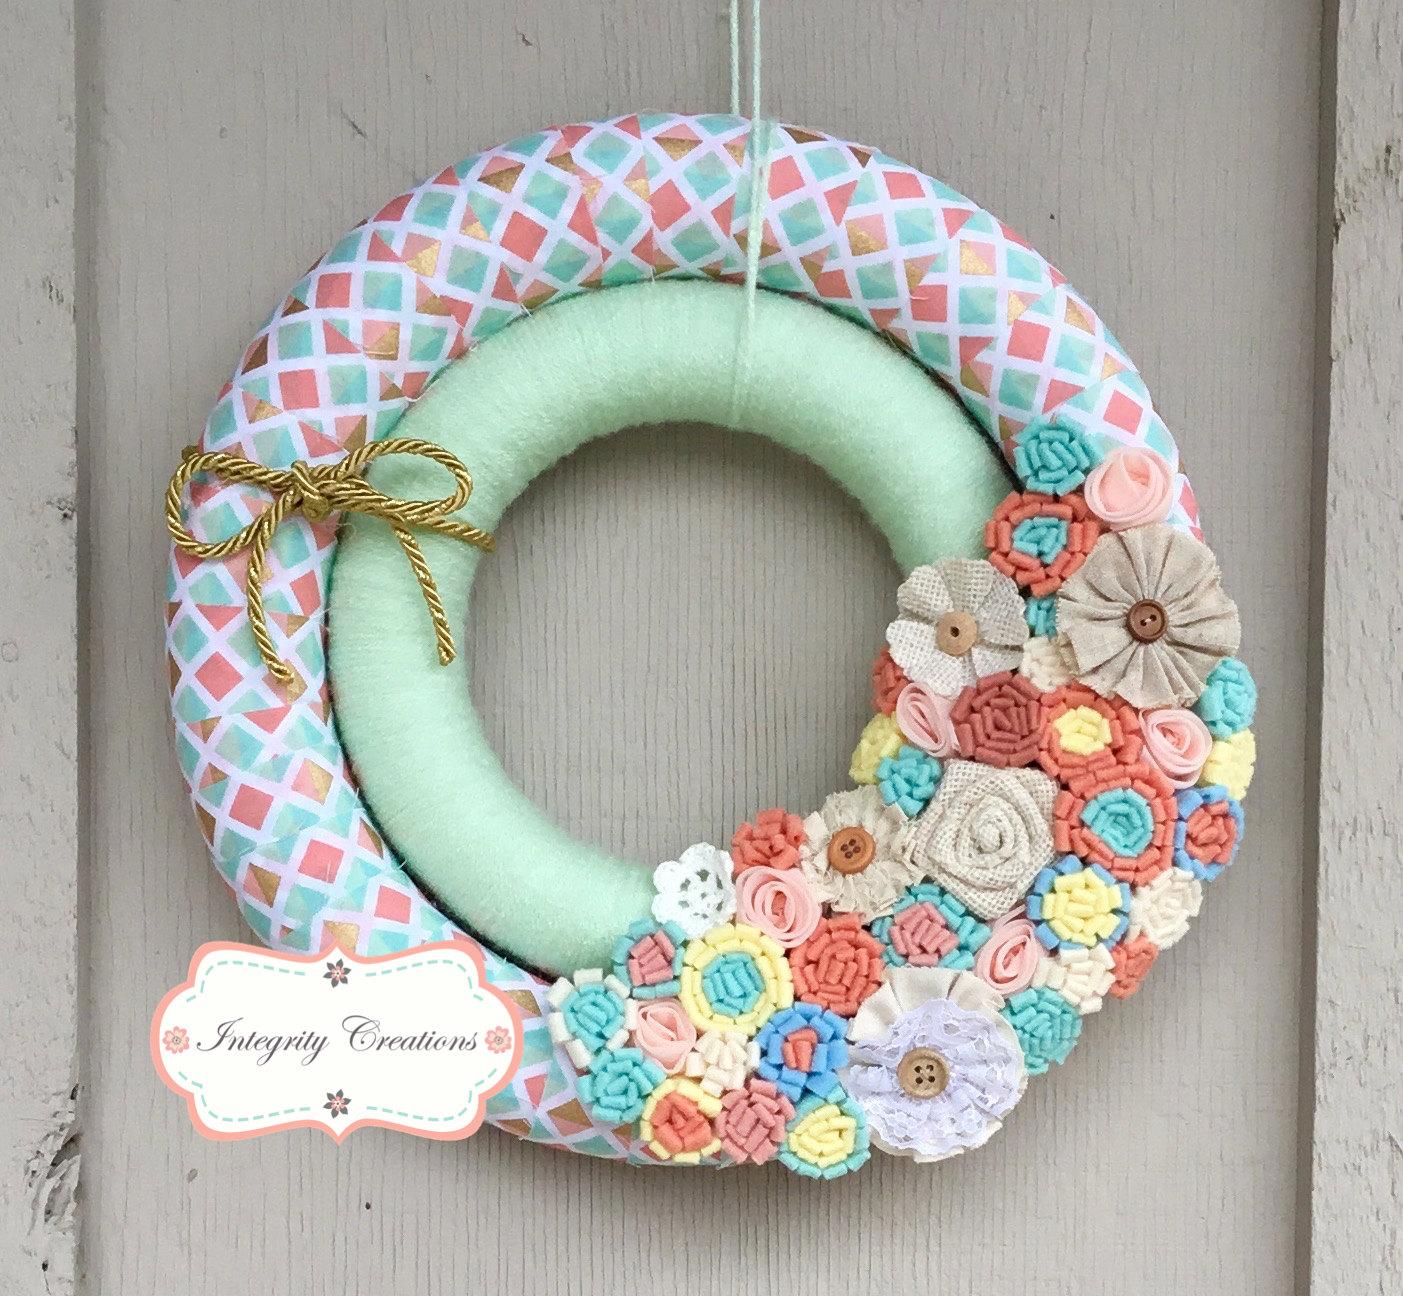 15 joyful handmade spring wreath ideas to decorate your for Handmade decoration